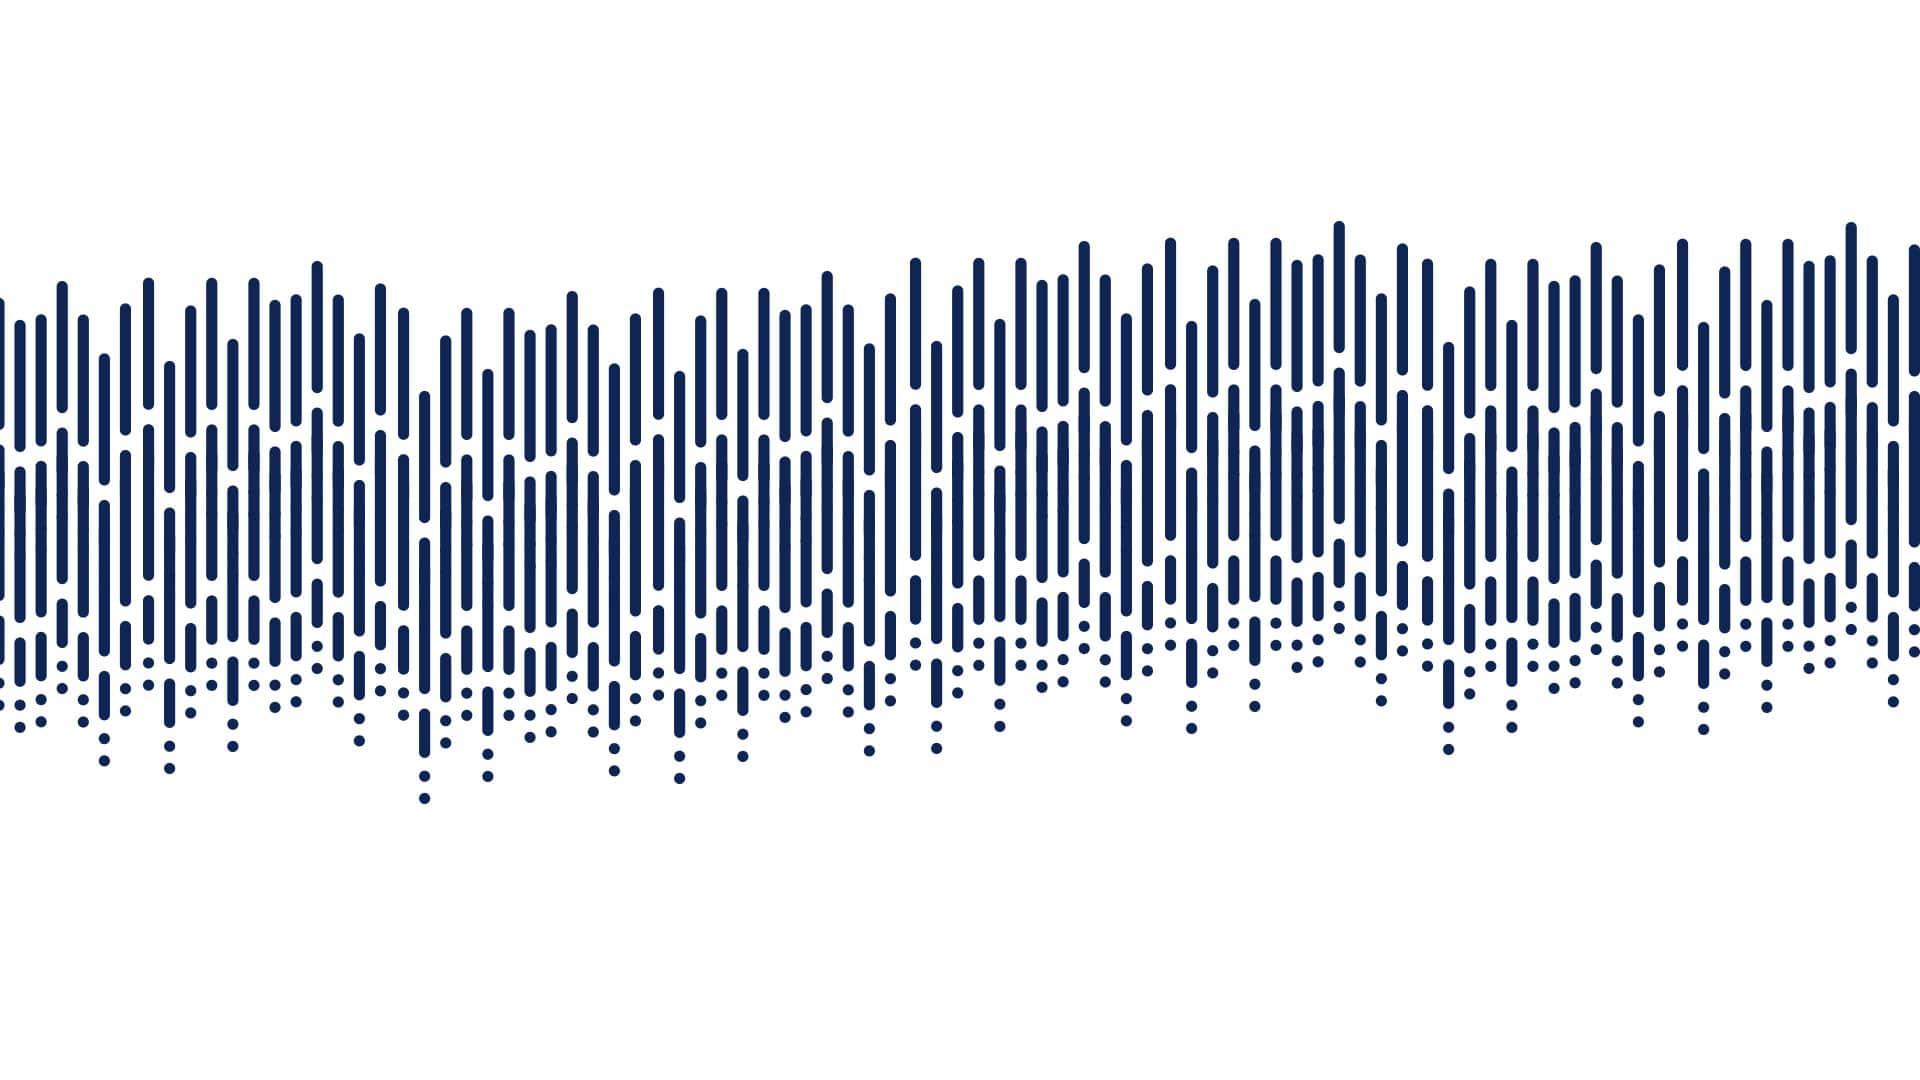 pattern deepdive